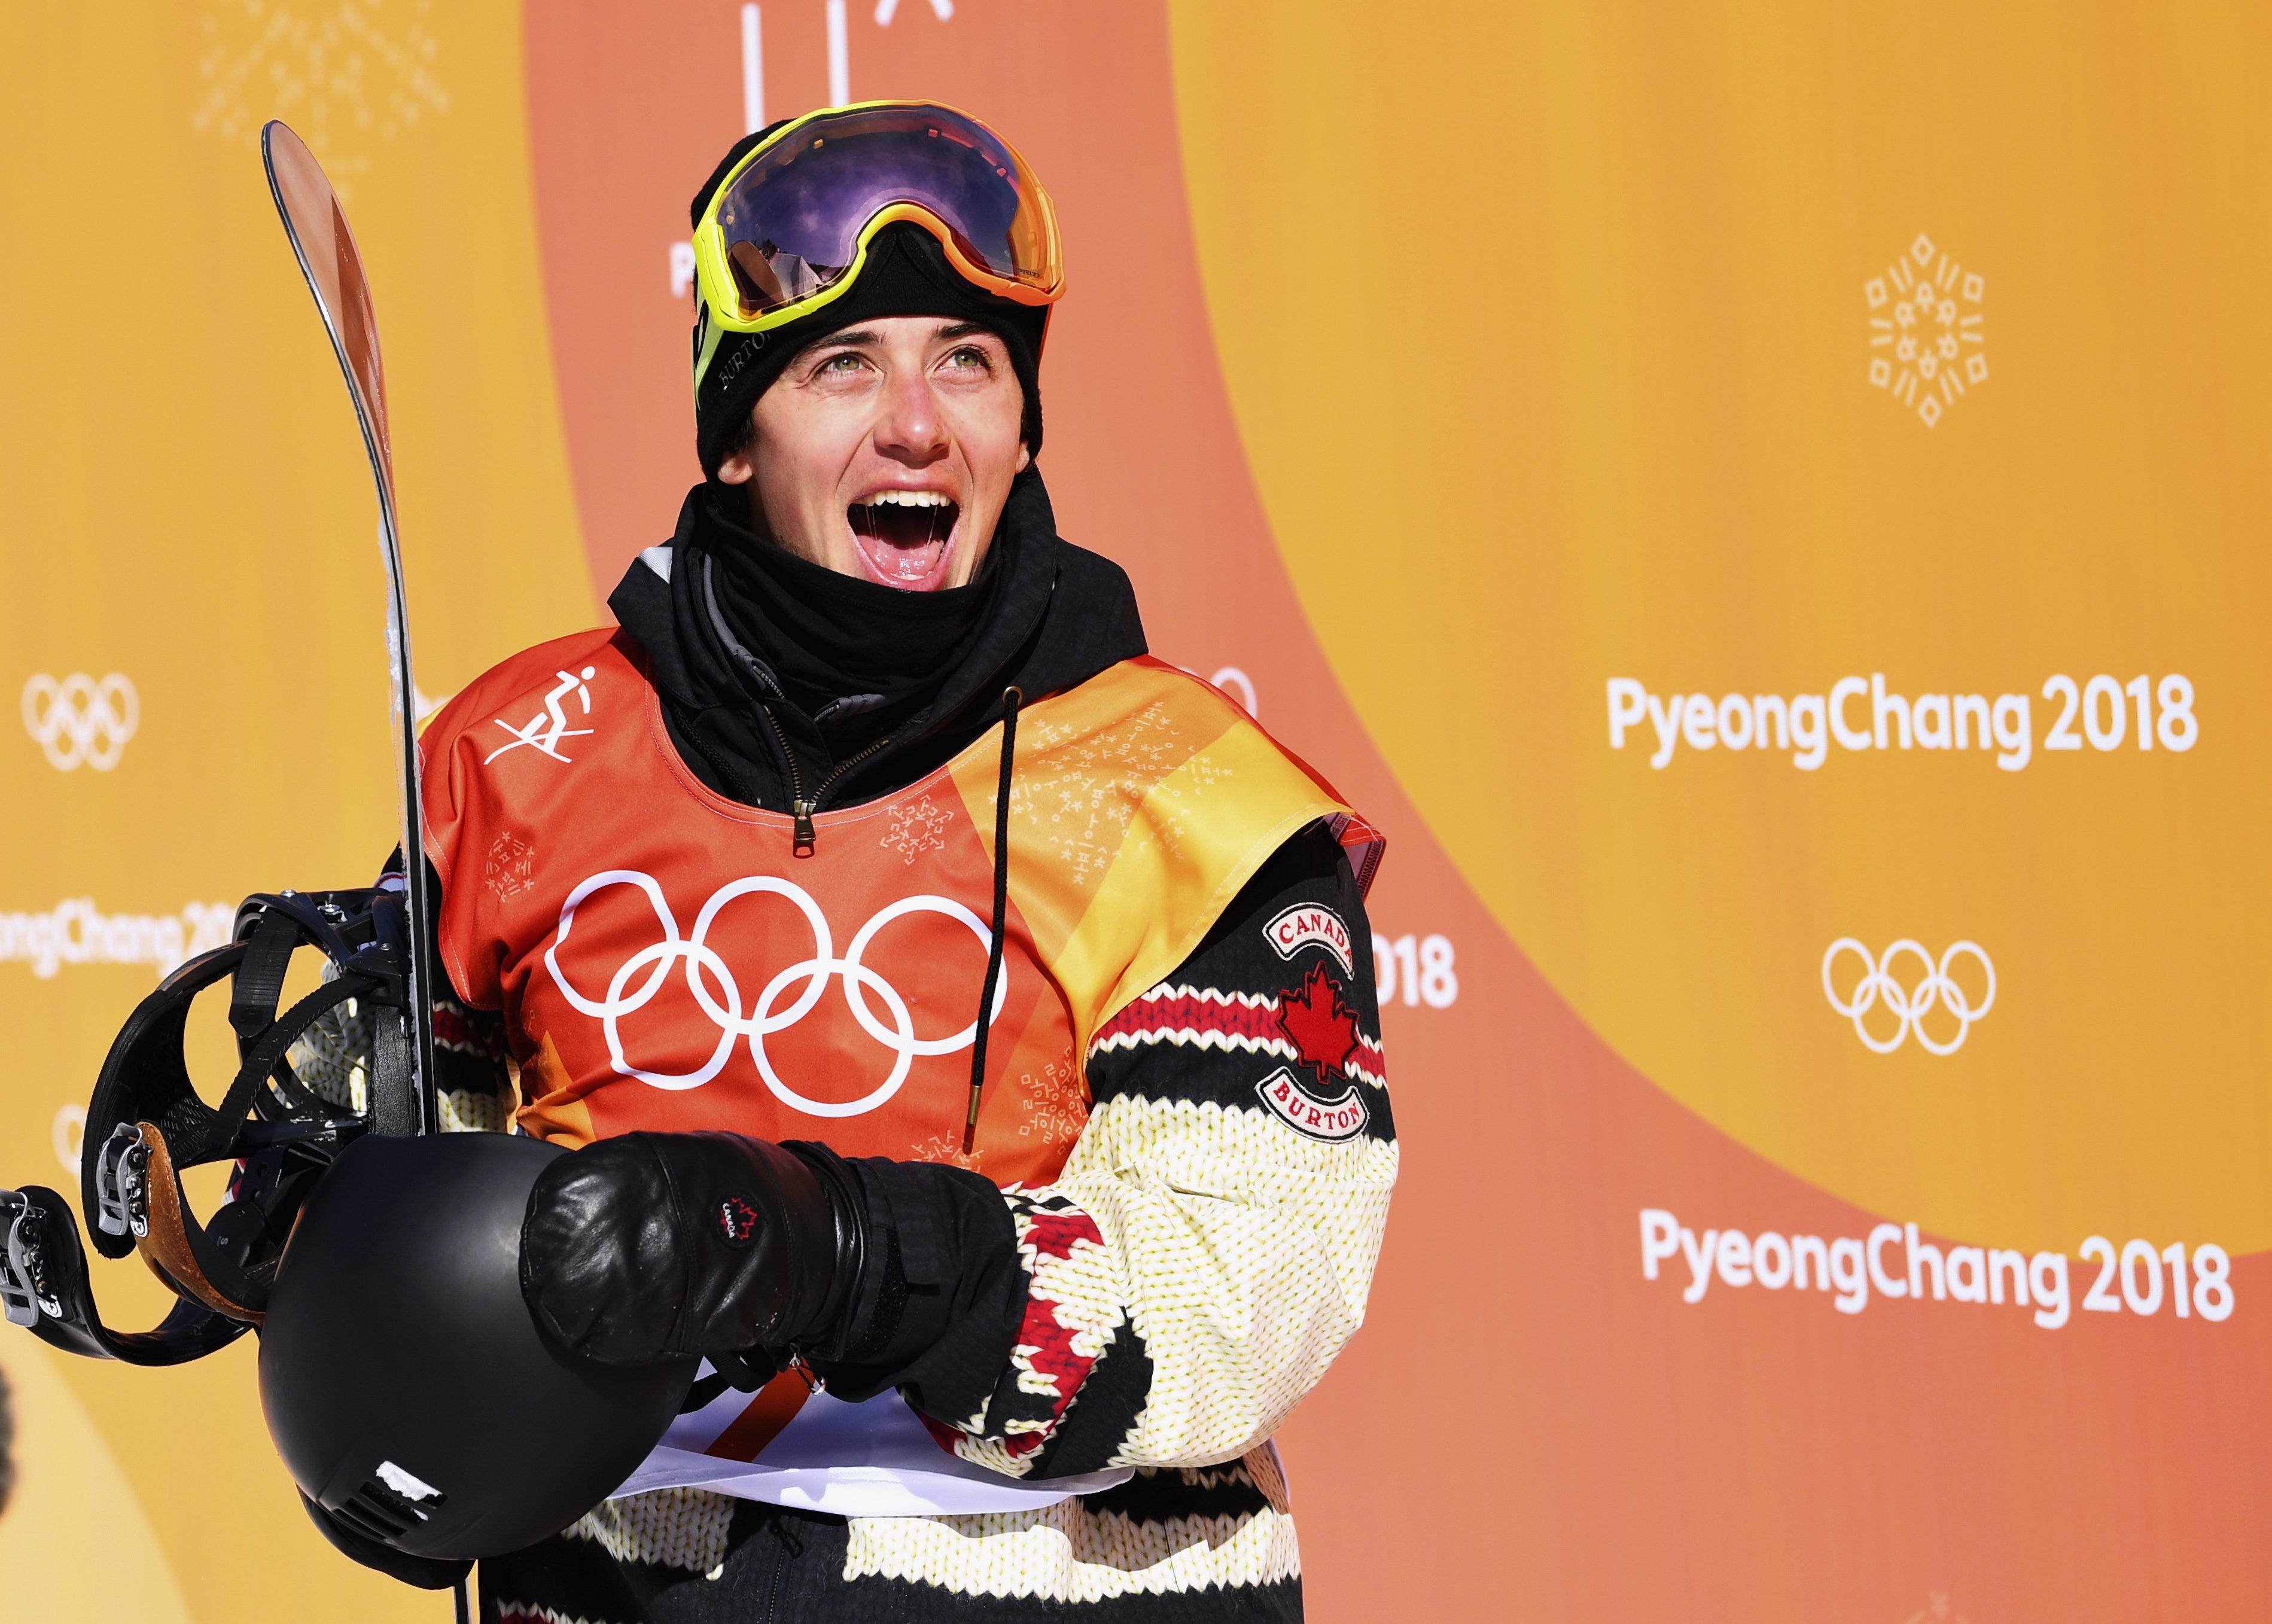 Snowboarding - Pyeongchang 2018 Winter Olympics - Men's Slopestyle Finals - Phoenix Snow Park - Pyeongchang, South Korea - February 11, 2018 -  Mark McMorris of Canada competes. REUTERS/Dylan Martinez